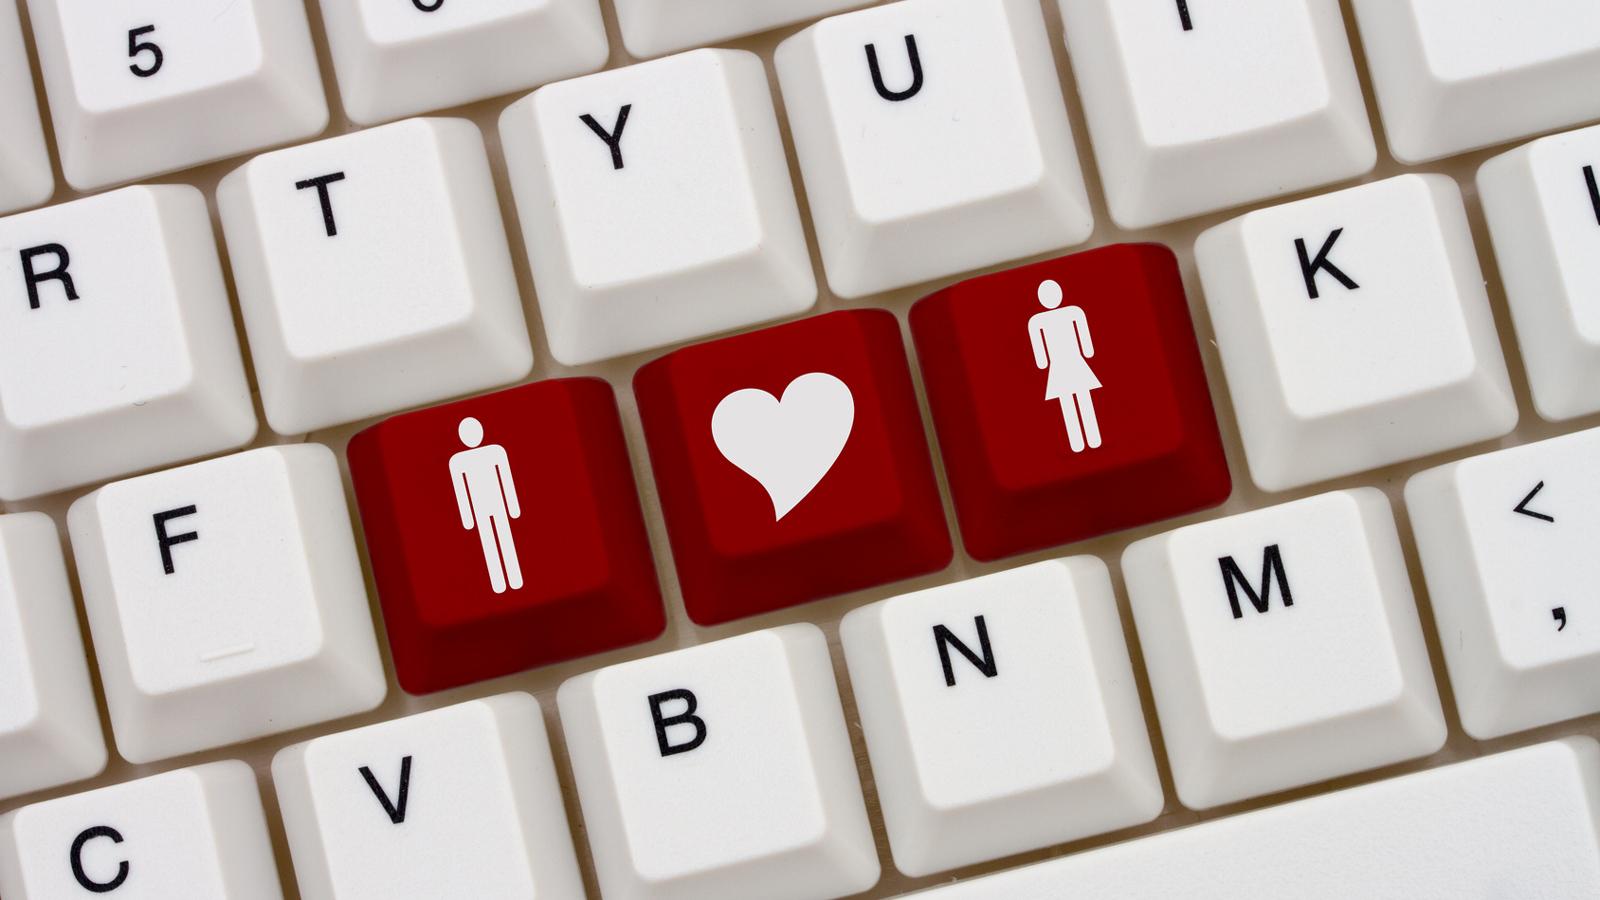 mujer busca relacion informal en buenos aires paship